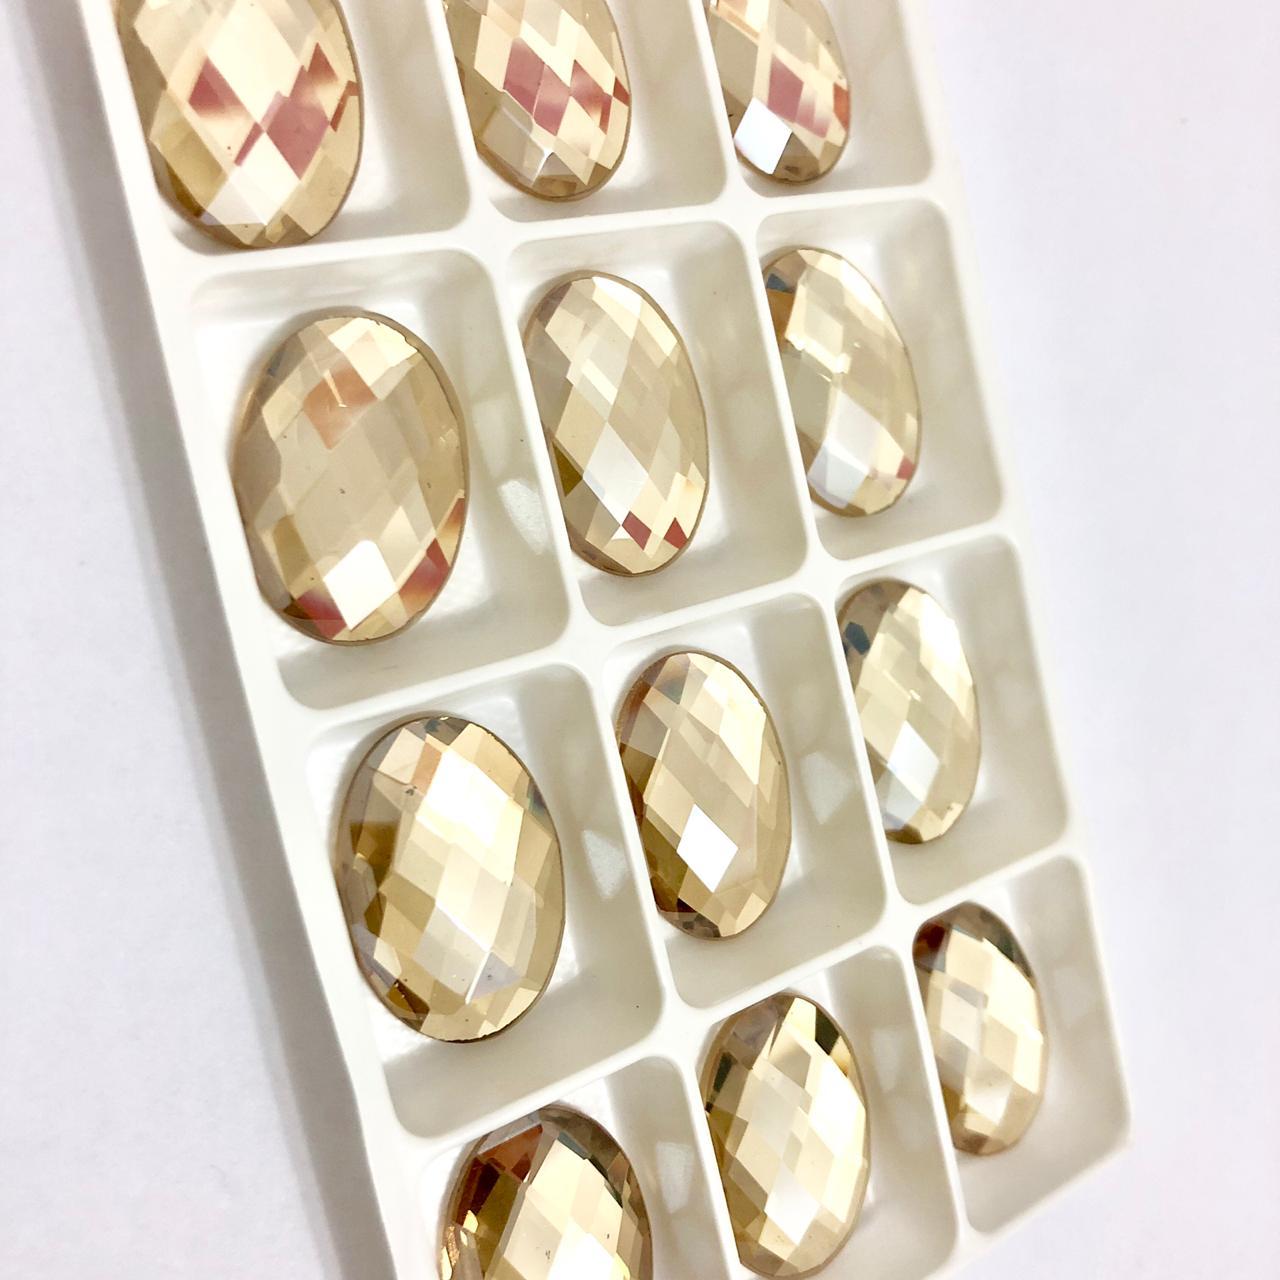 PEDRA OVAL CRISTAL GOLDEN SHADOW PARA COLAGEM SEM FURO (18X25mm)